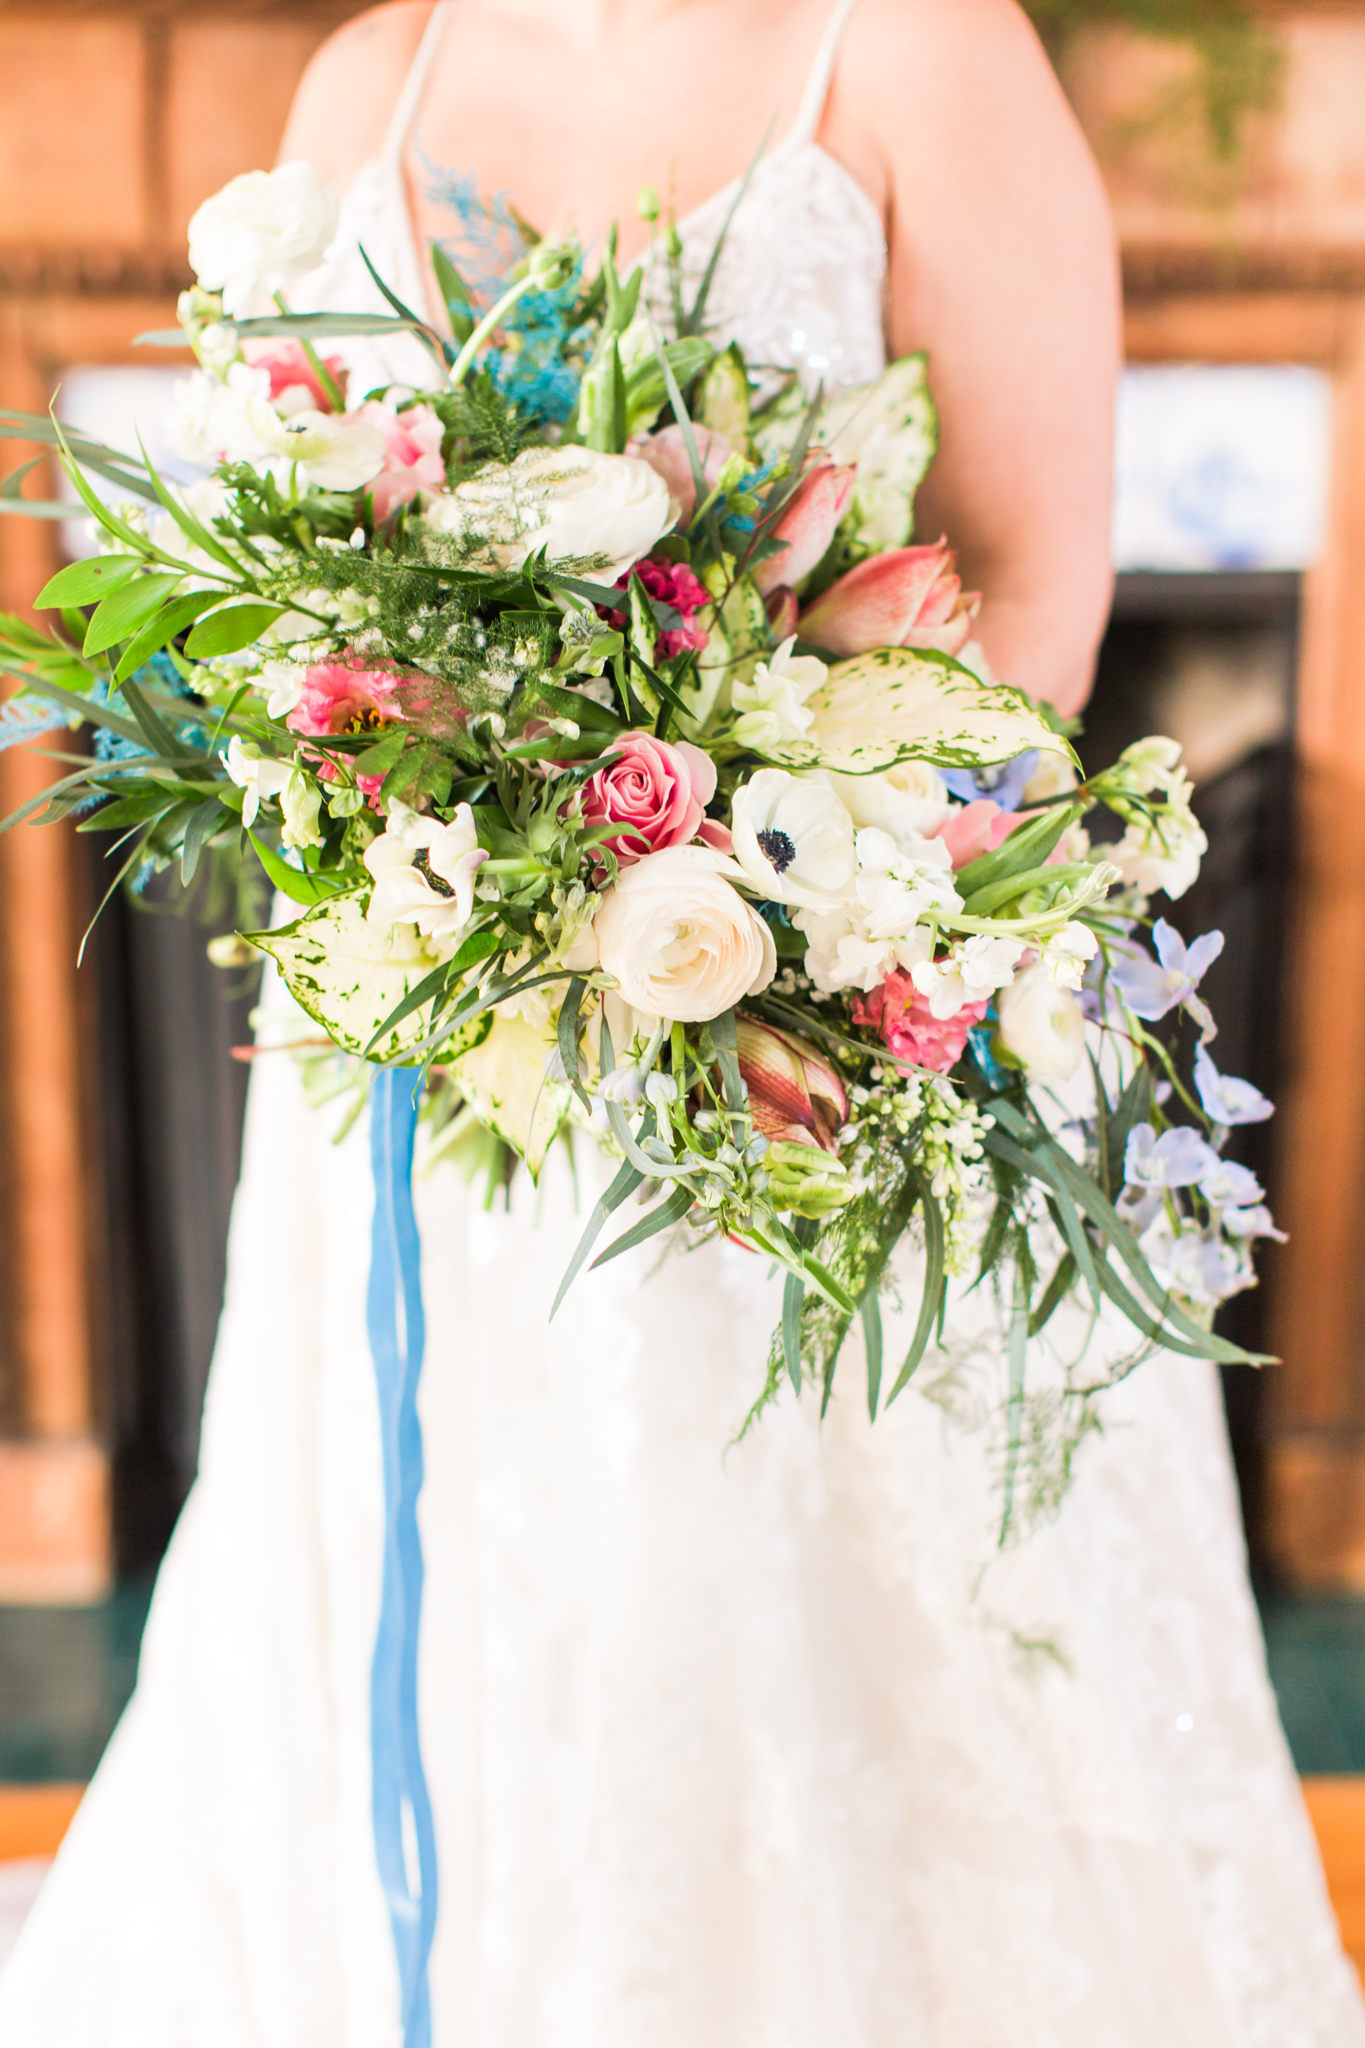 Haley Mansion Winter Wedding - Shaina Lee Photography-249.jpg